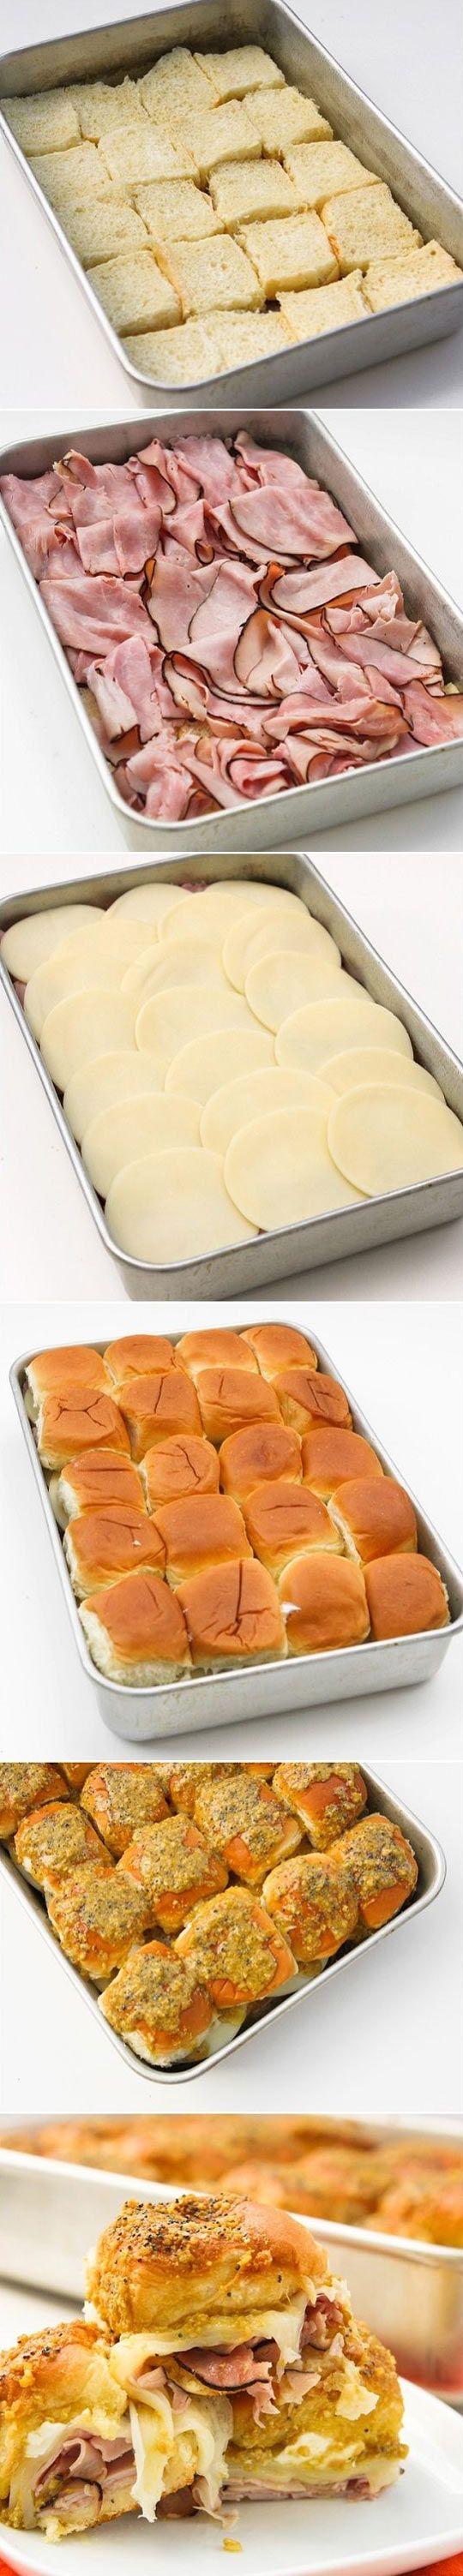 Pintxoak,Pan, Jamón y queso horno, se pinta con yema de huevo y se espolvorea amapola o sesamo.